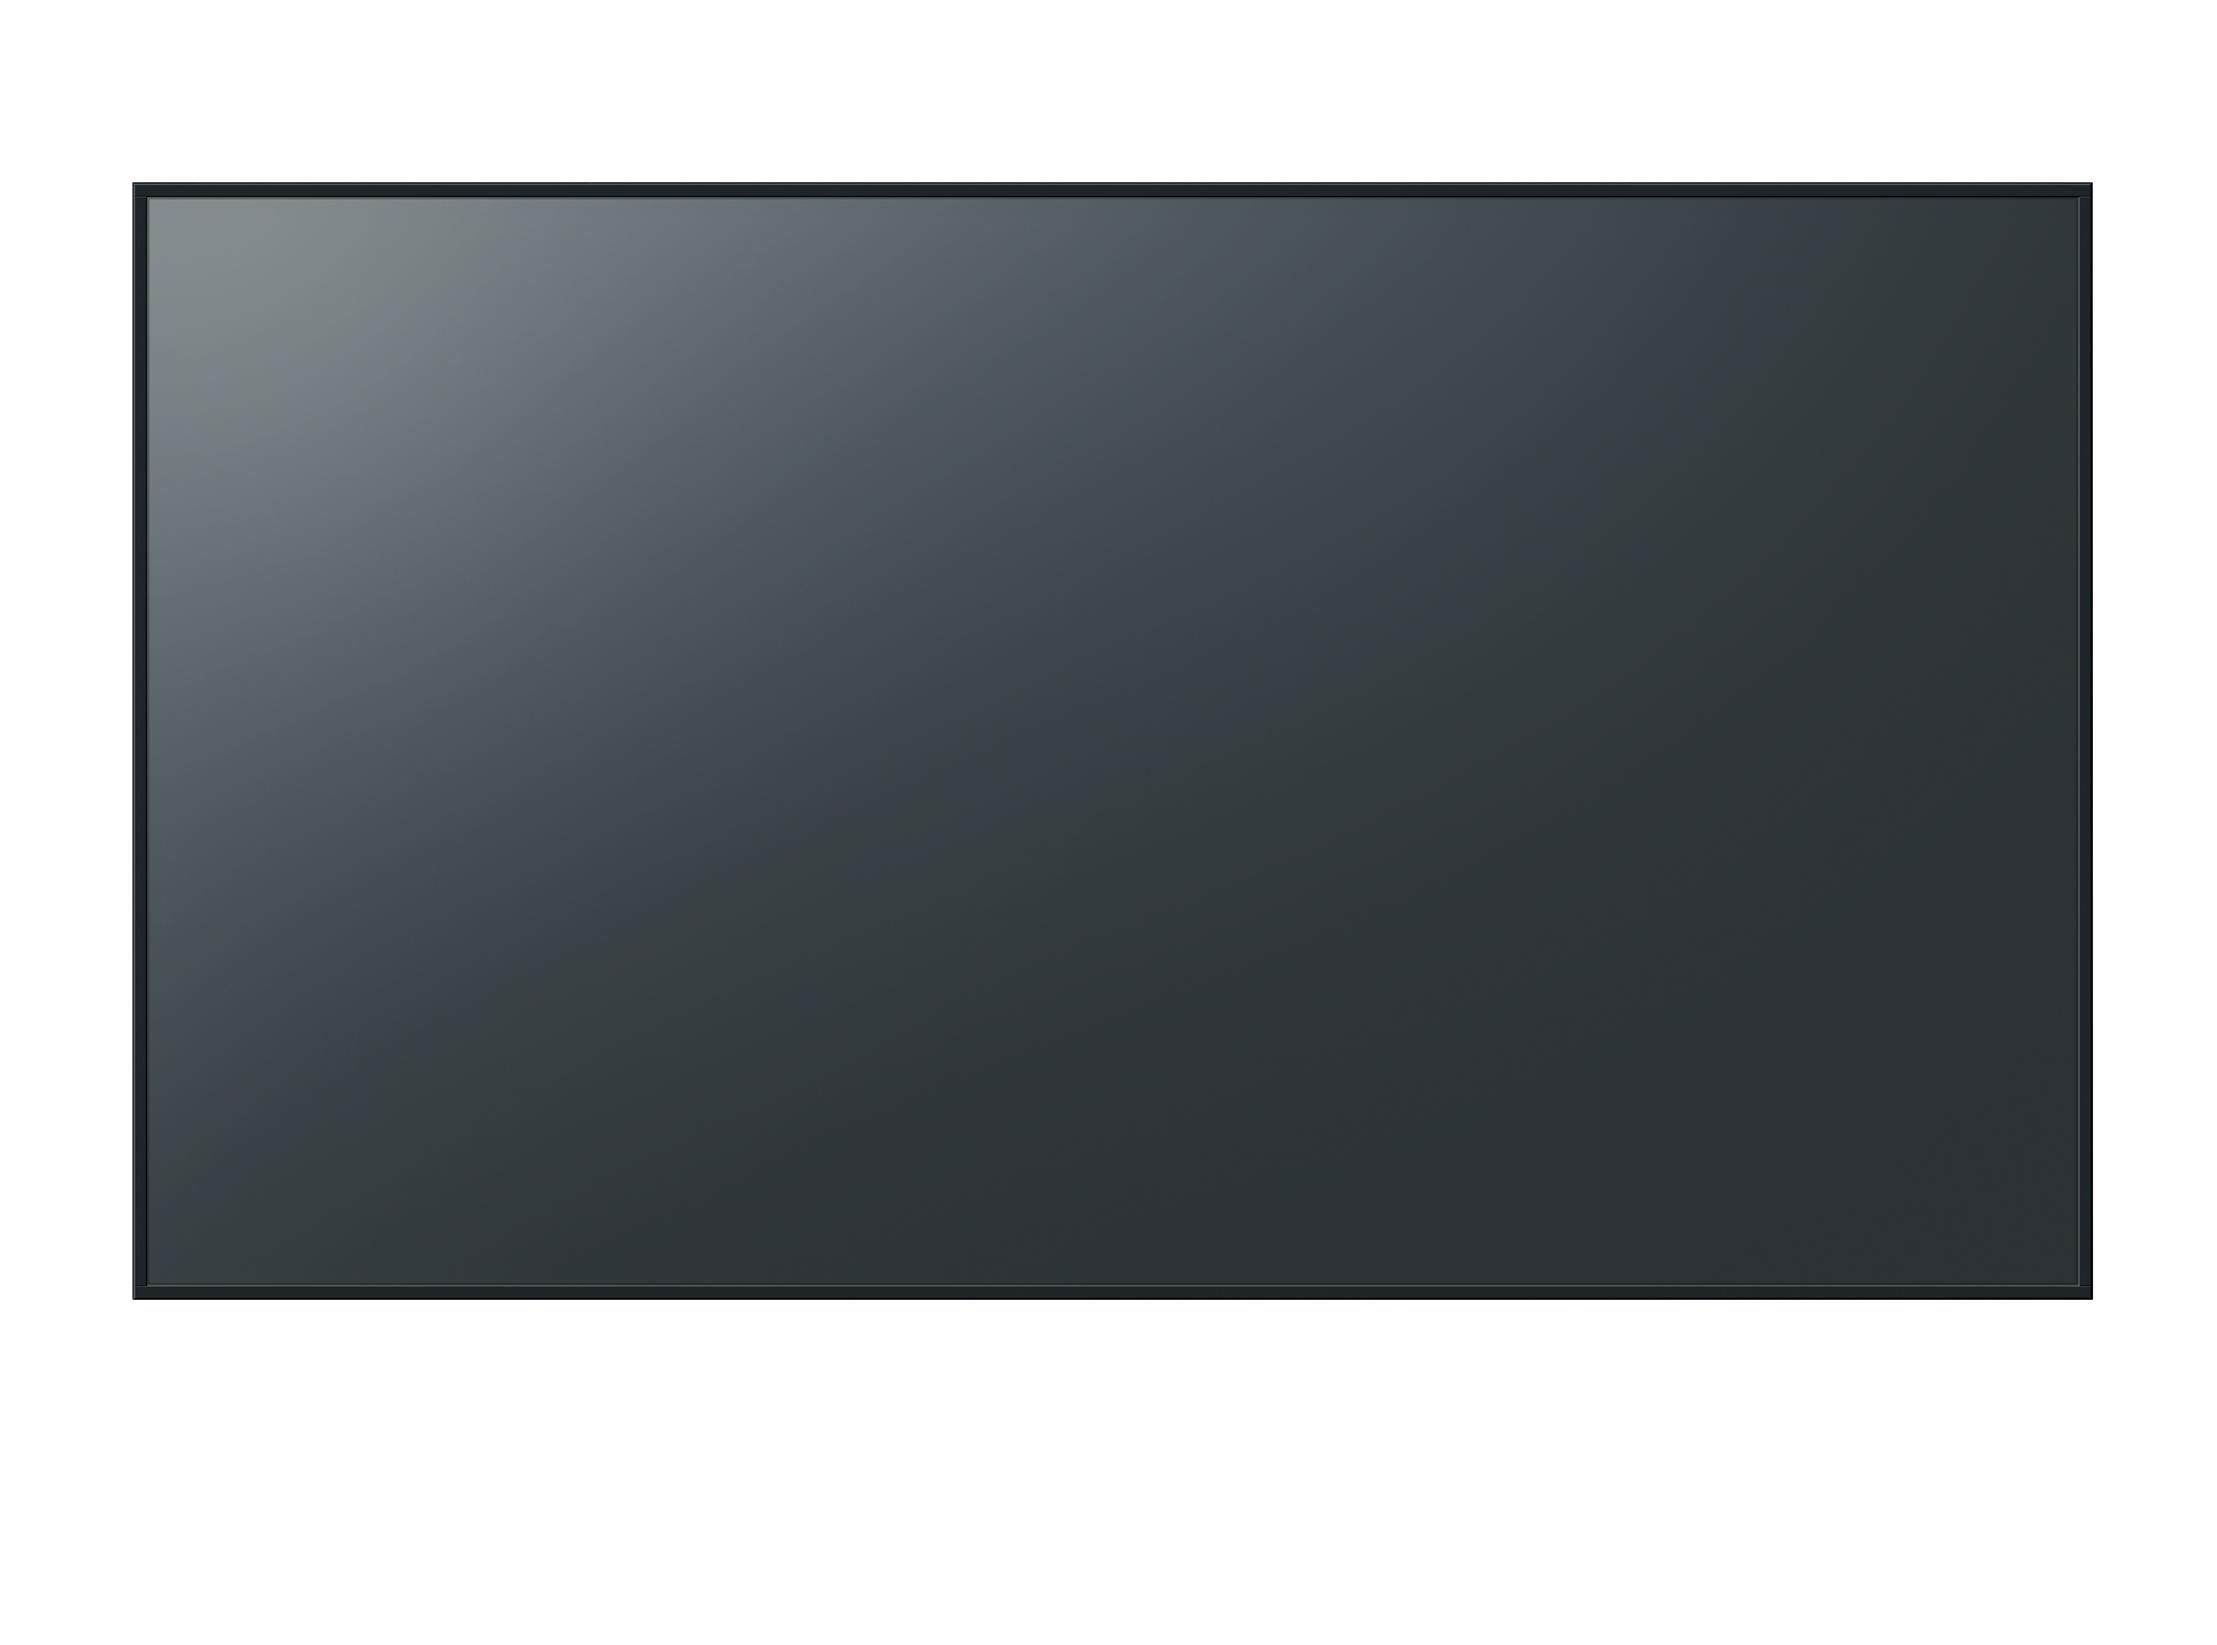 PANASONIC PANASONIC TH65EQ1 - Ecran professionnel résolution USB 4K 350cd - 65``